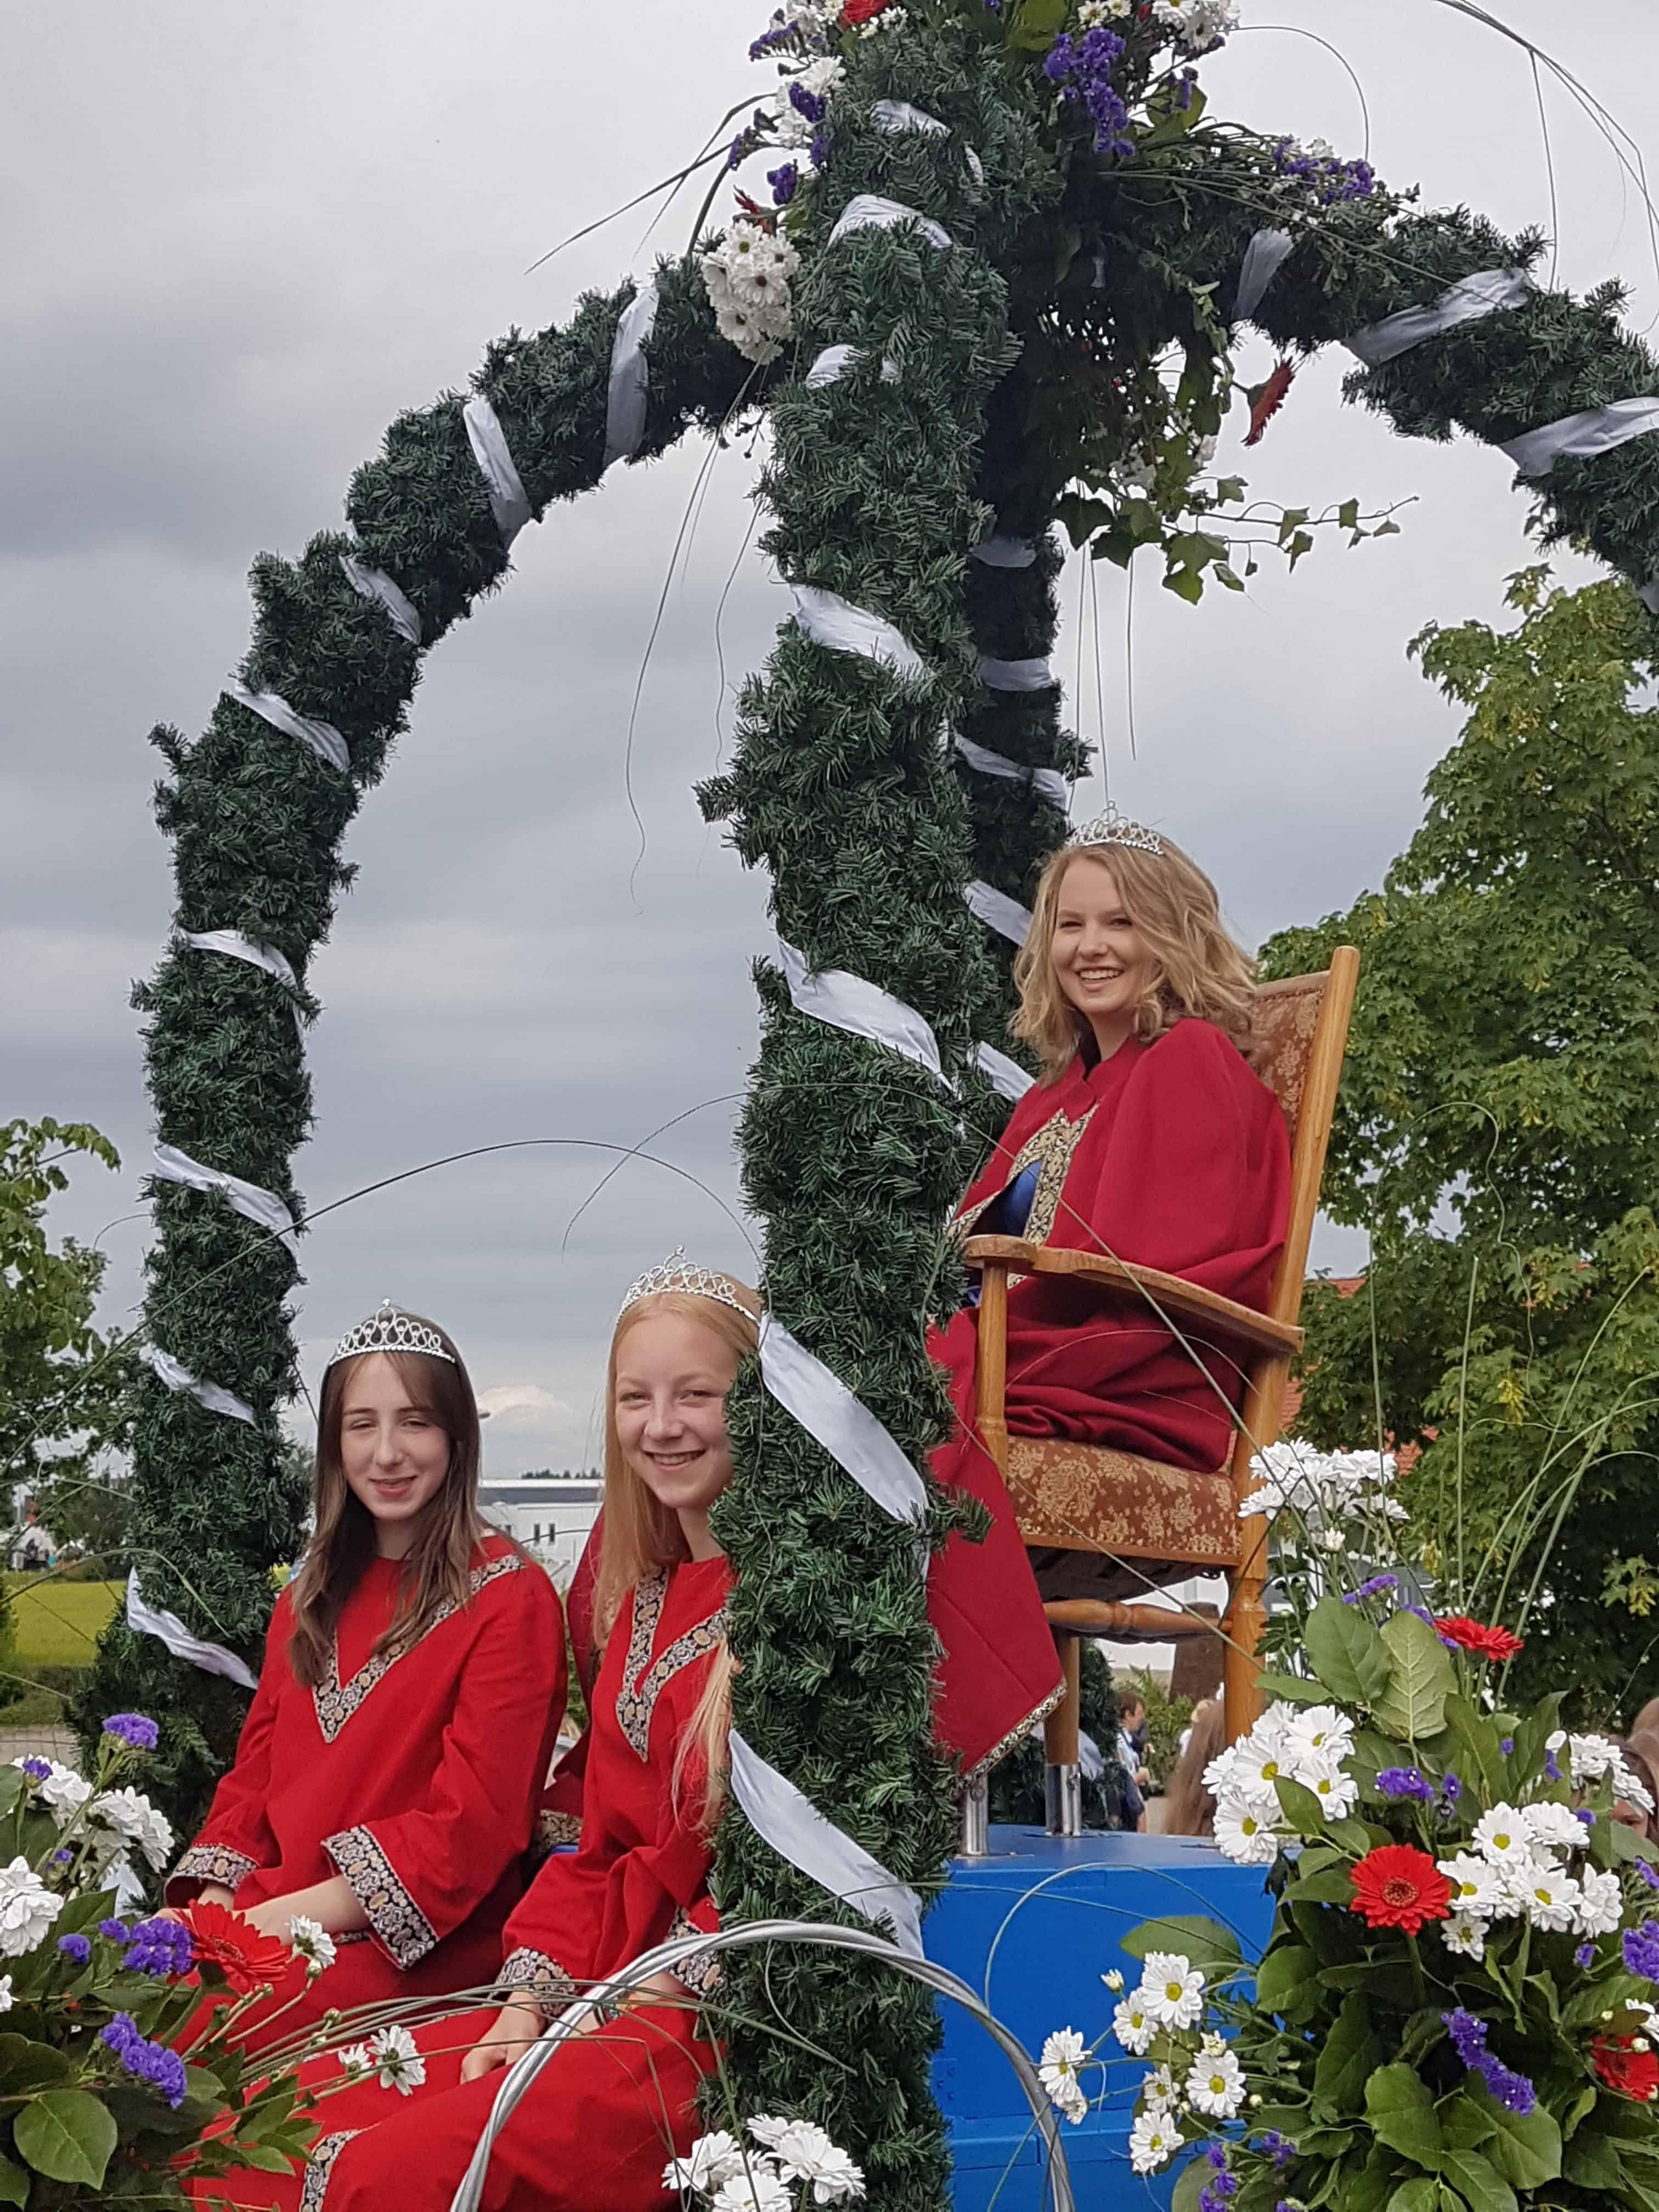 Adelindisfest 2018 – Rückblick und Danksagung